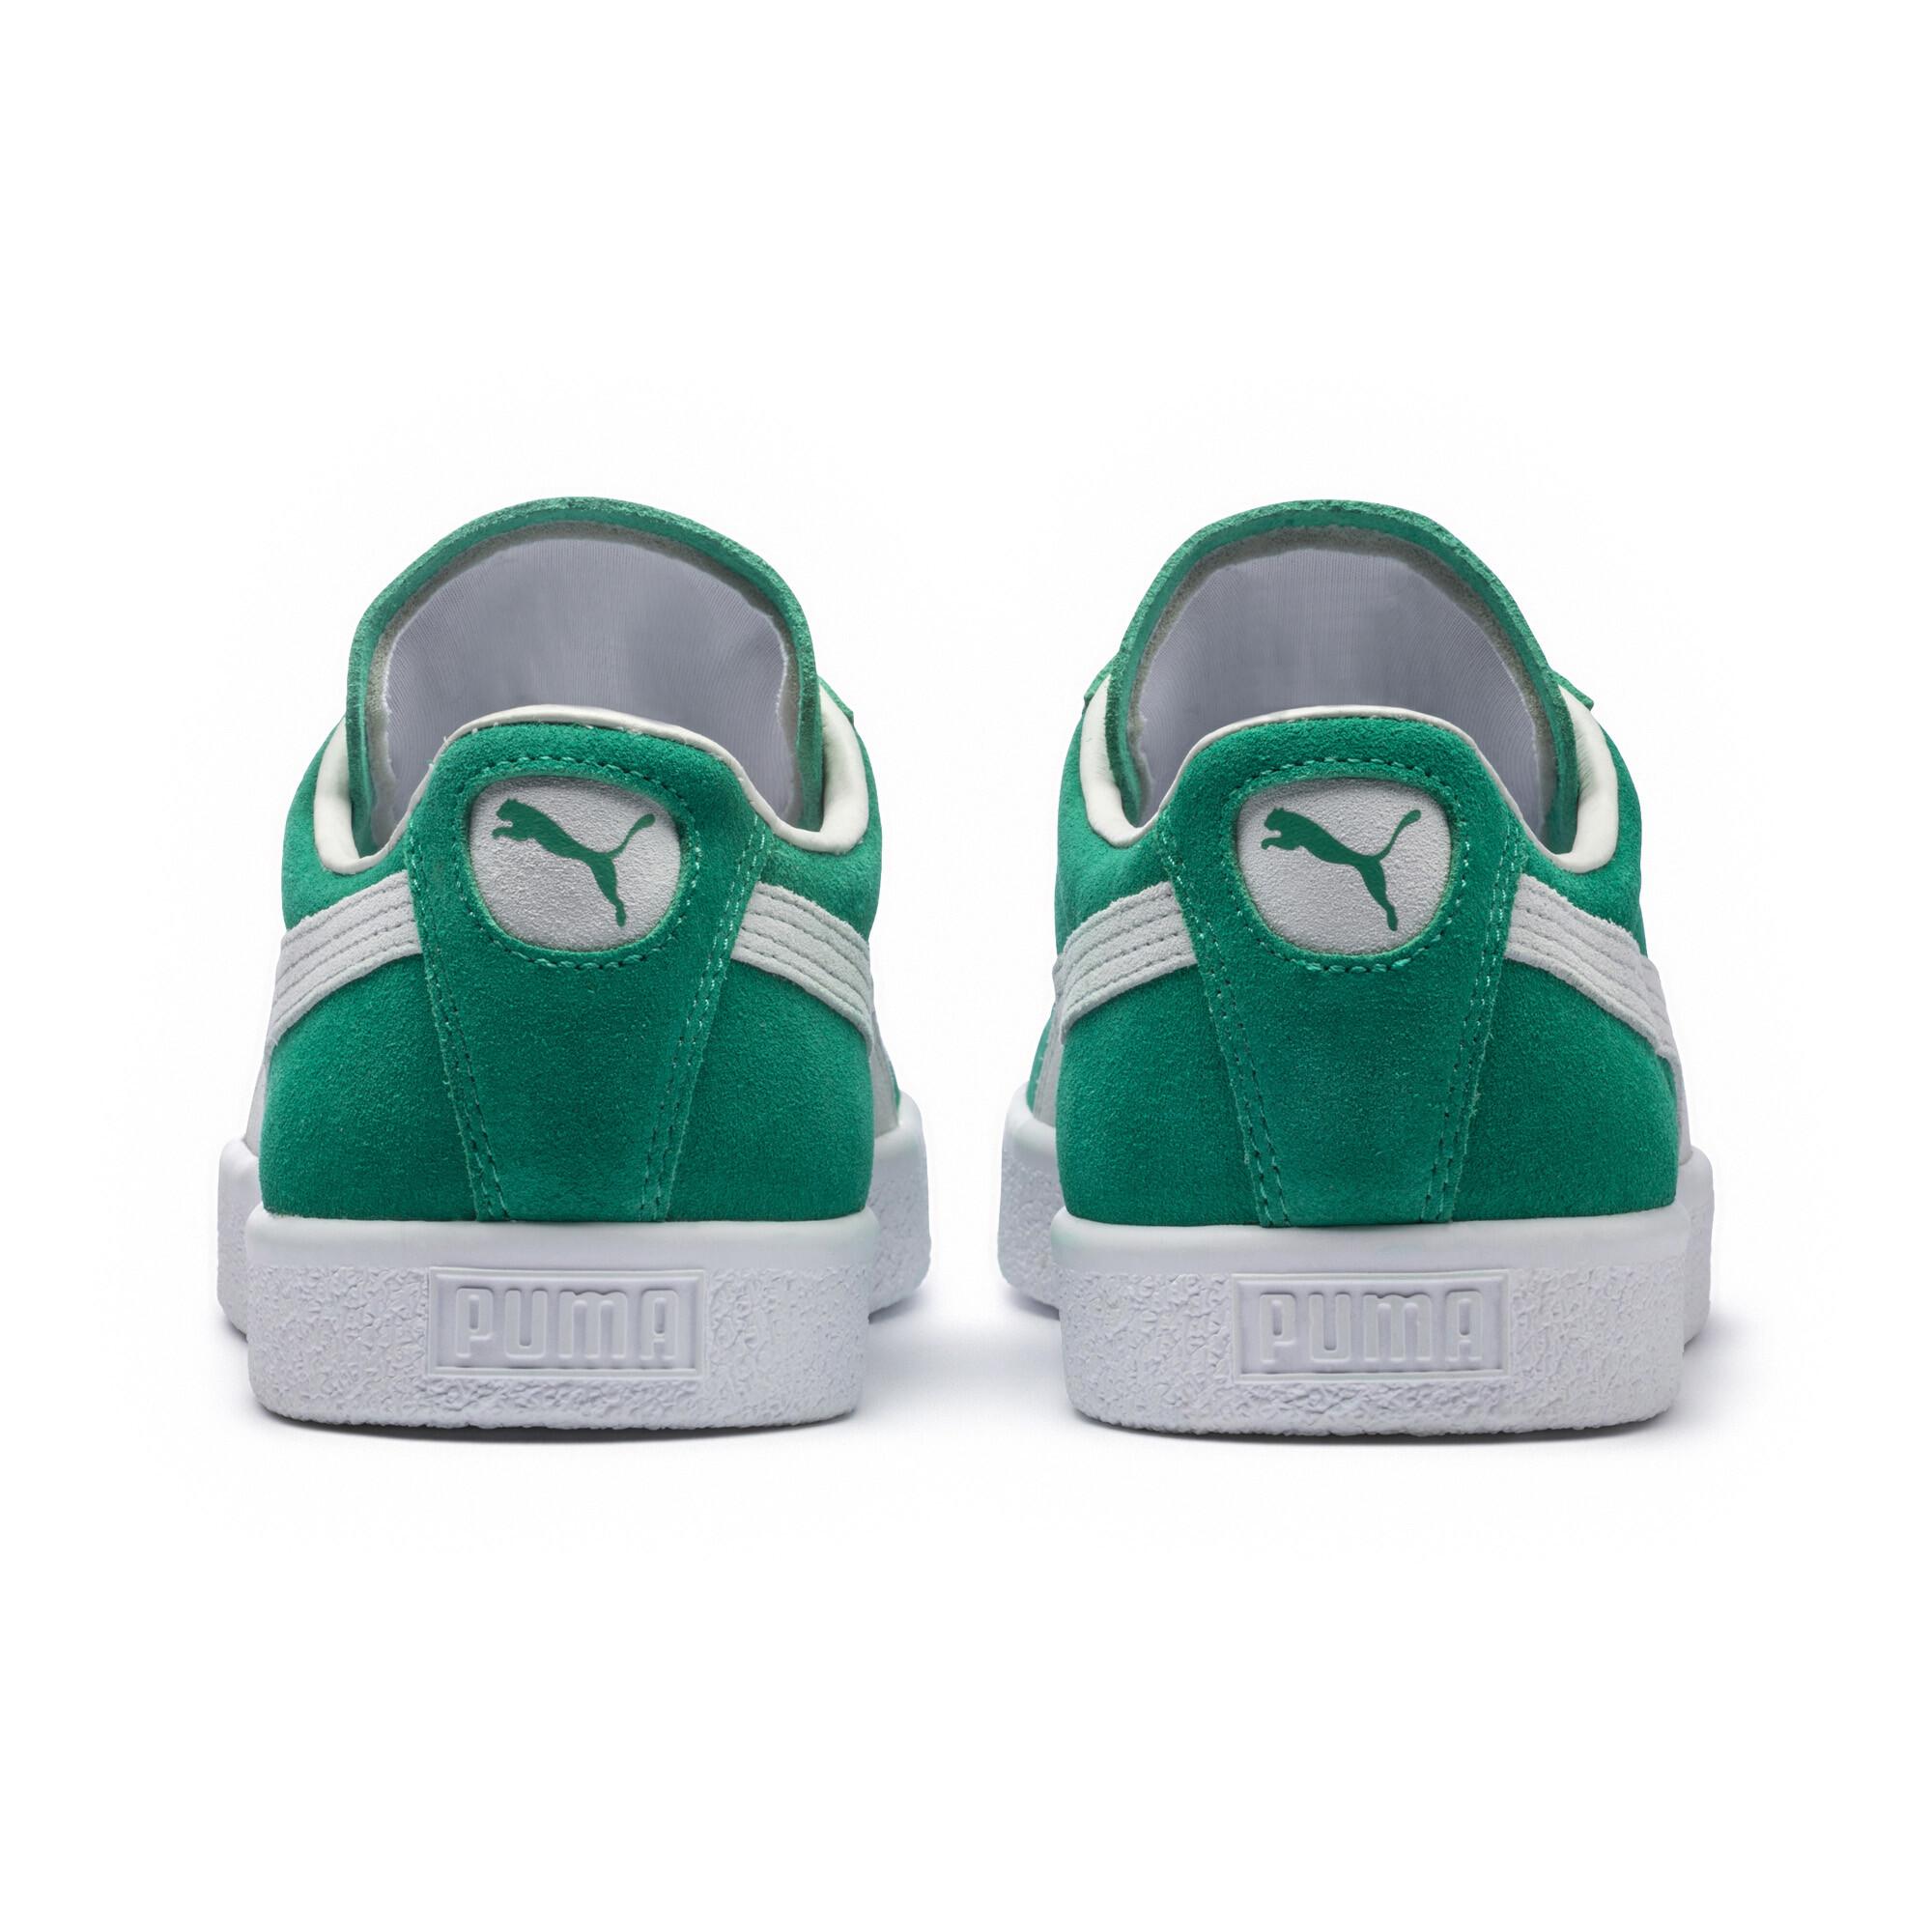 Image Puma Suede 90681 Sneakers #4